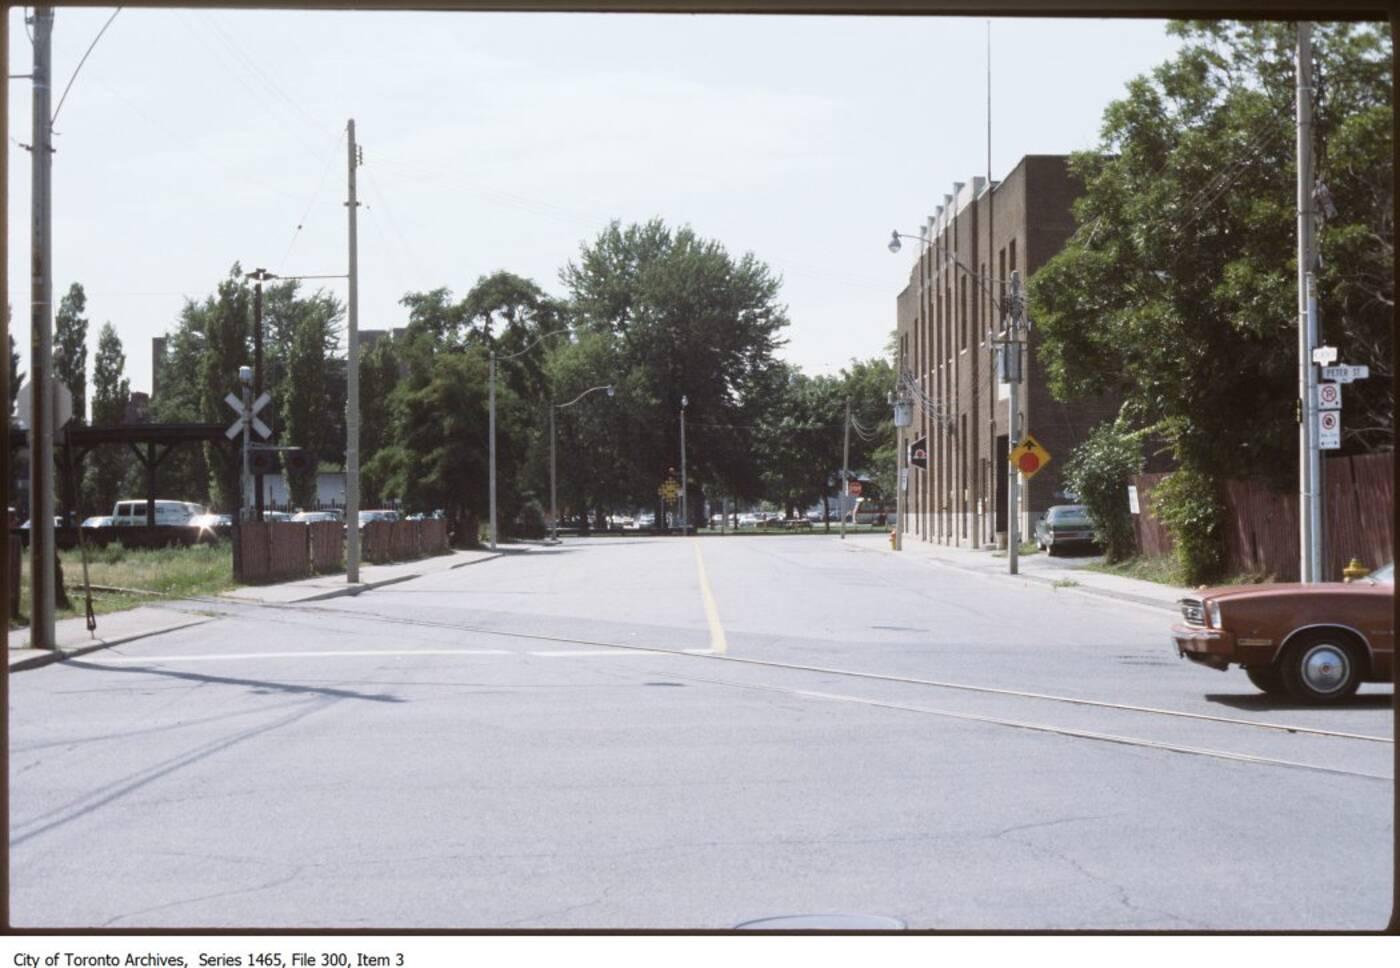 toronto traffic 1970s